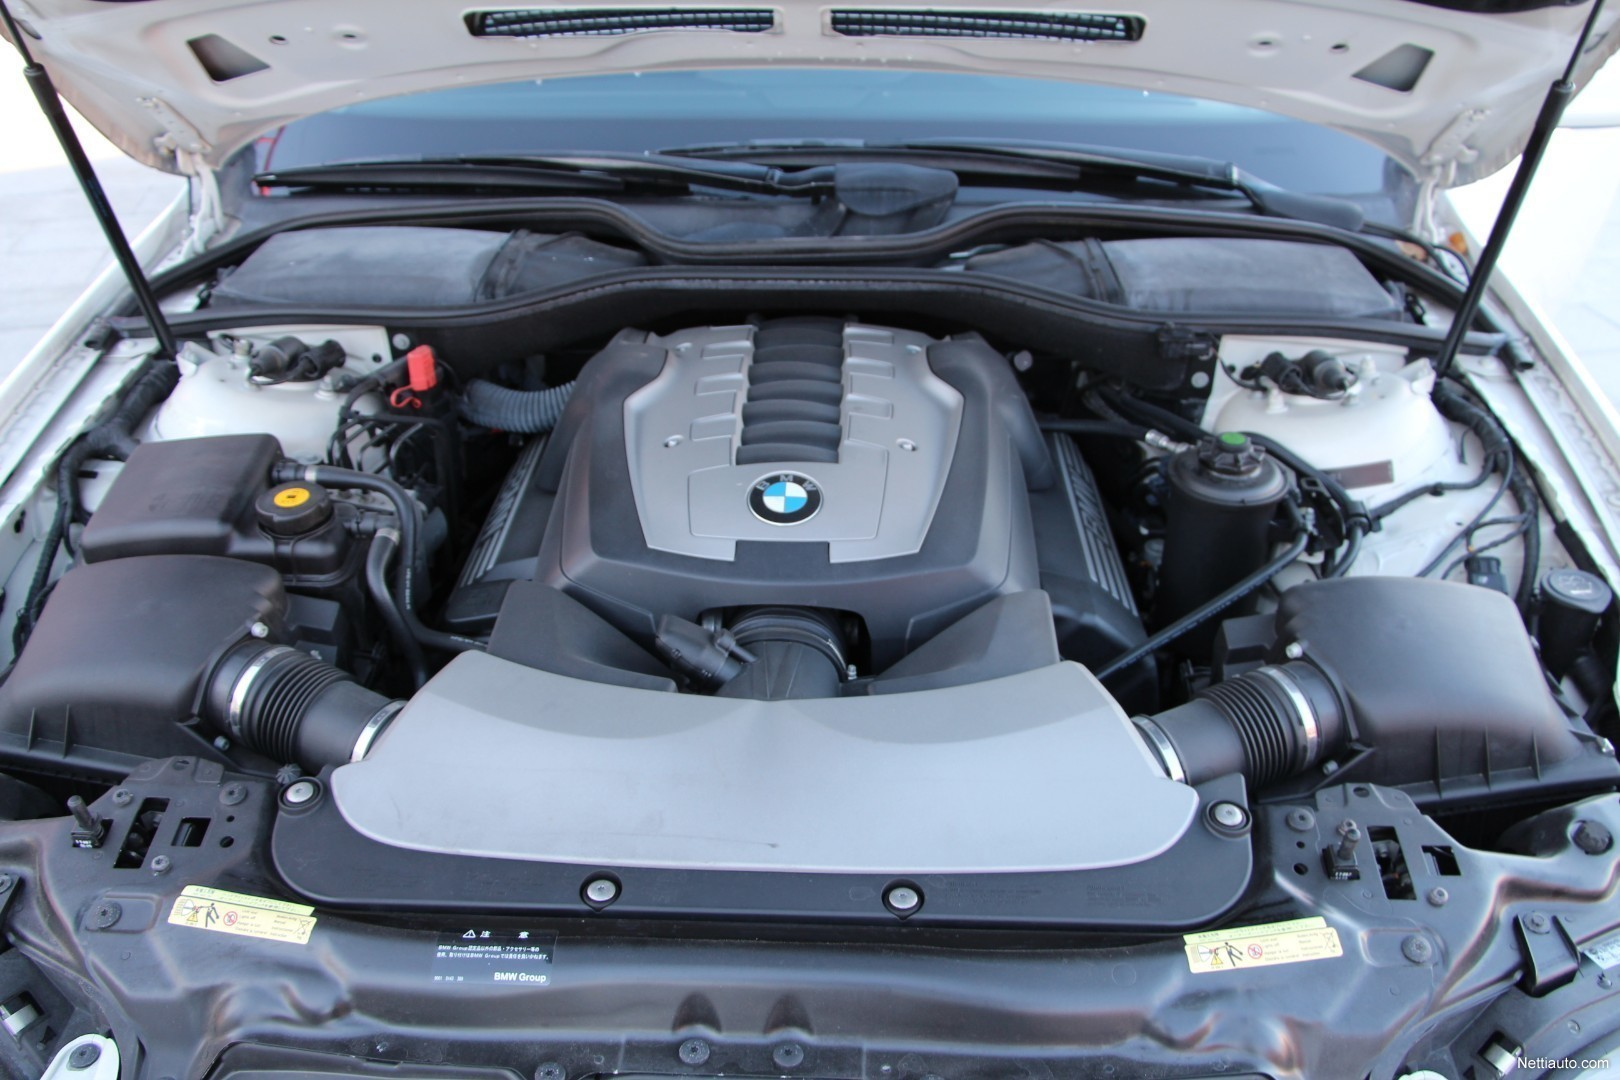 Bmw 750 Alpina Wbahl81040dh78723 Sedan 2007 Used Vehicle Nettiauto Auto Repair 735i 1986 Electrical Add To Compare